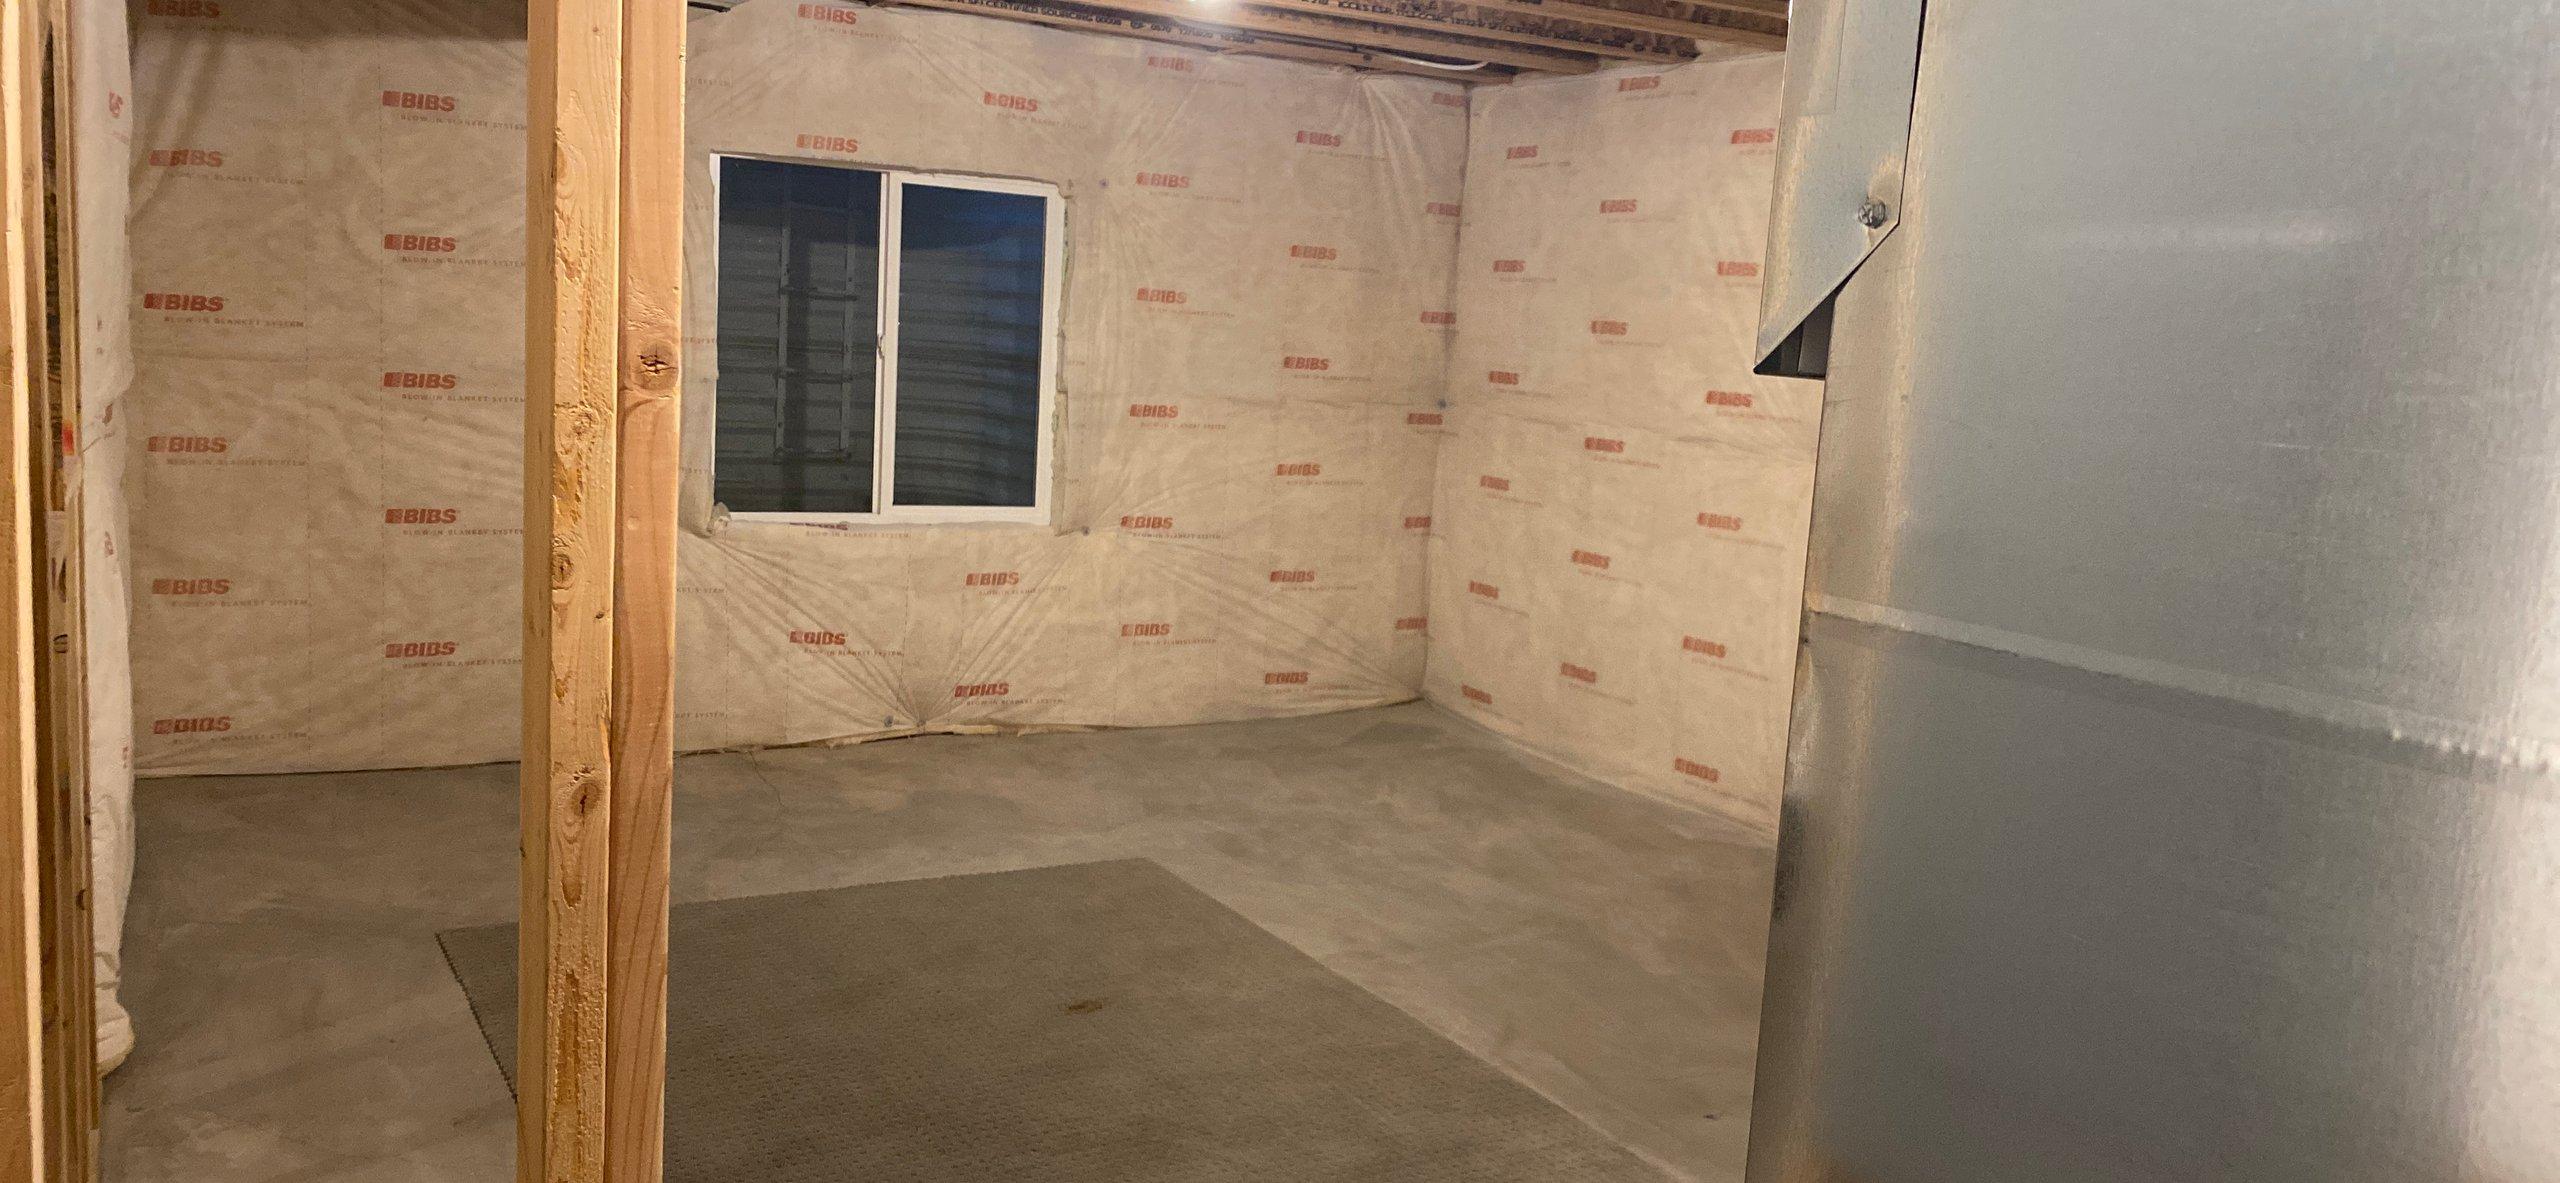 17x15 Basement self storage unit